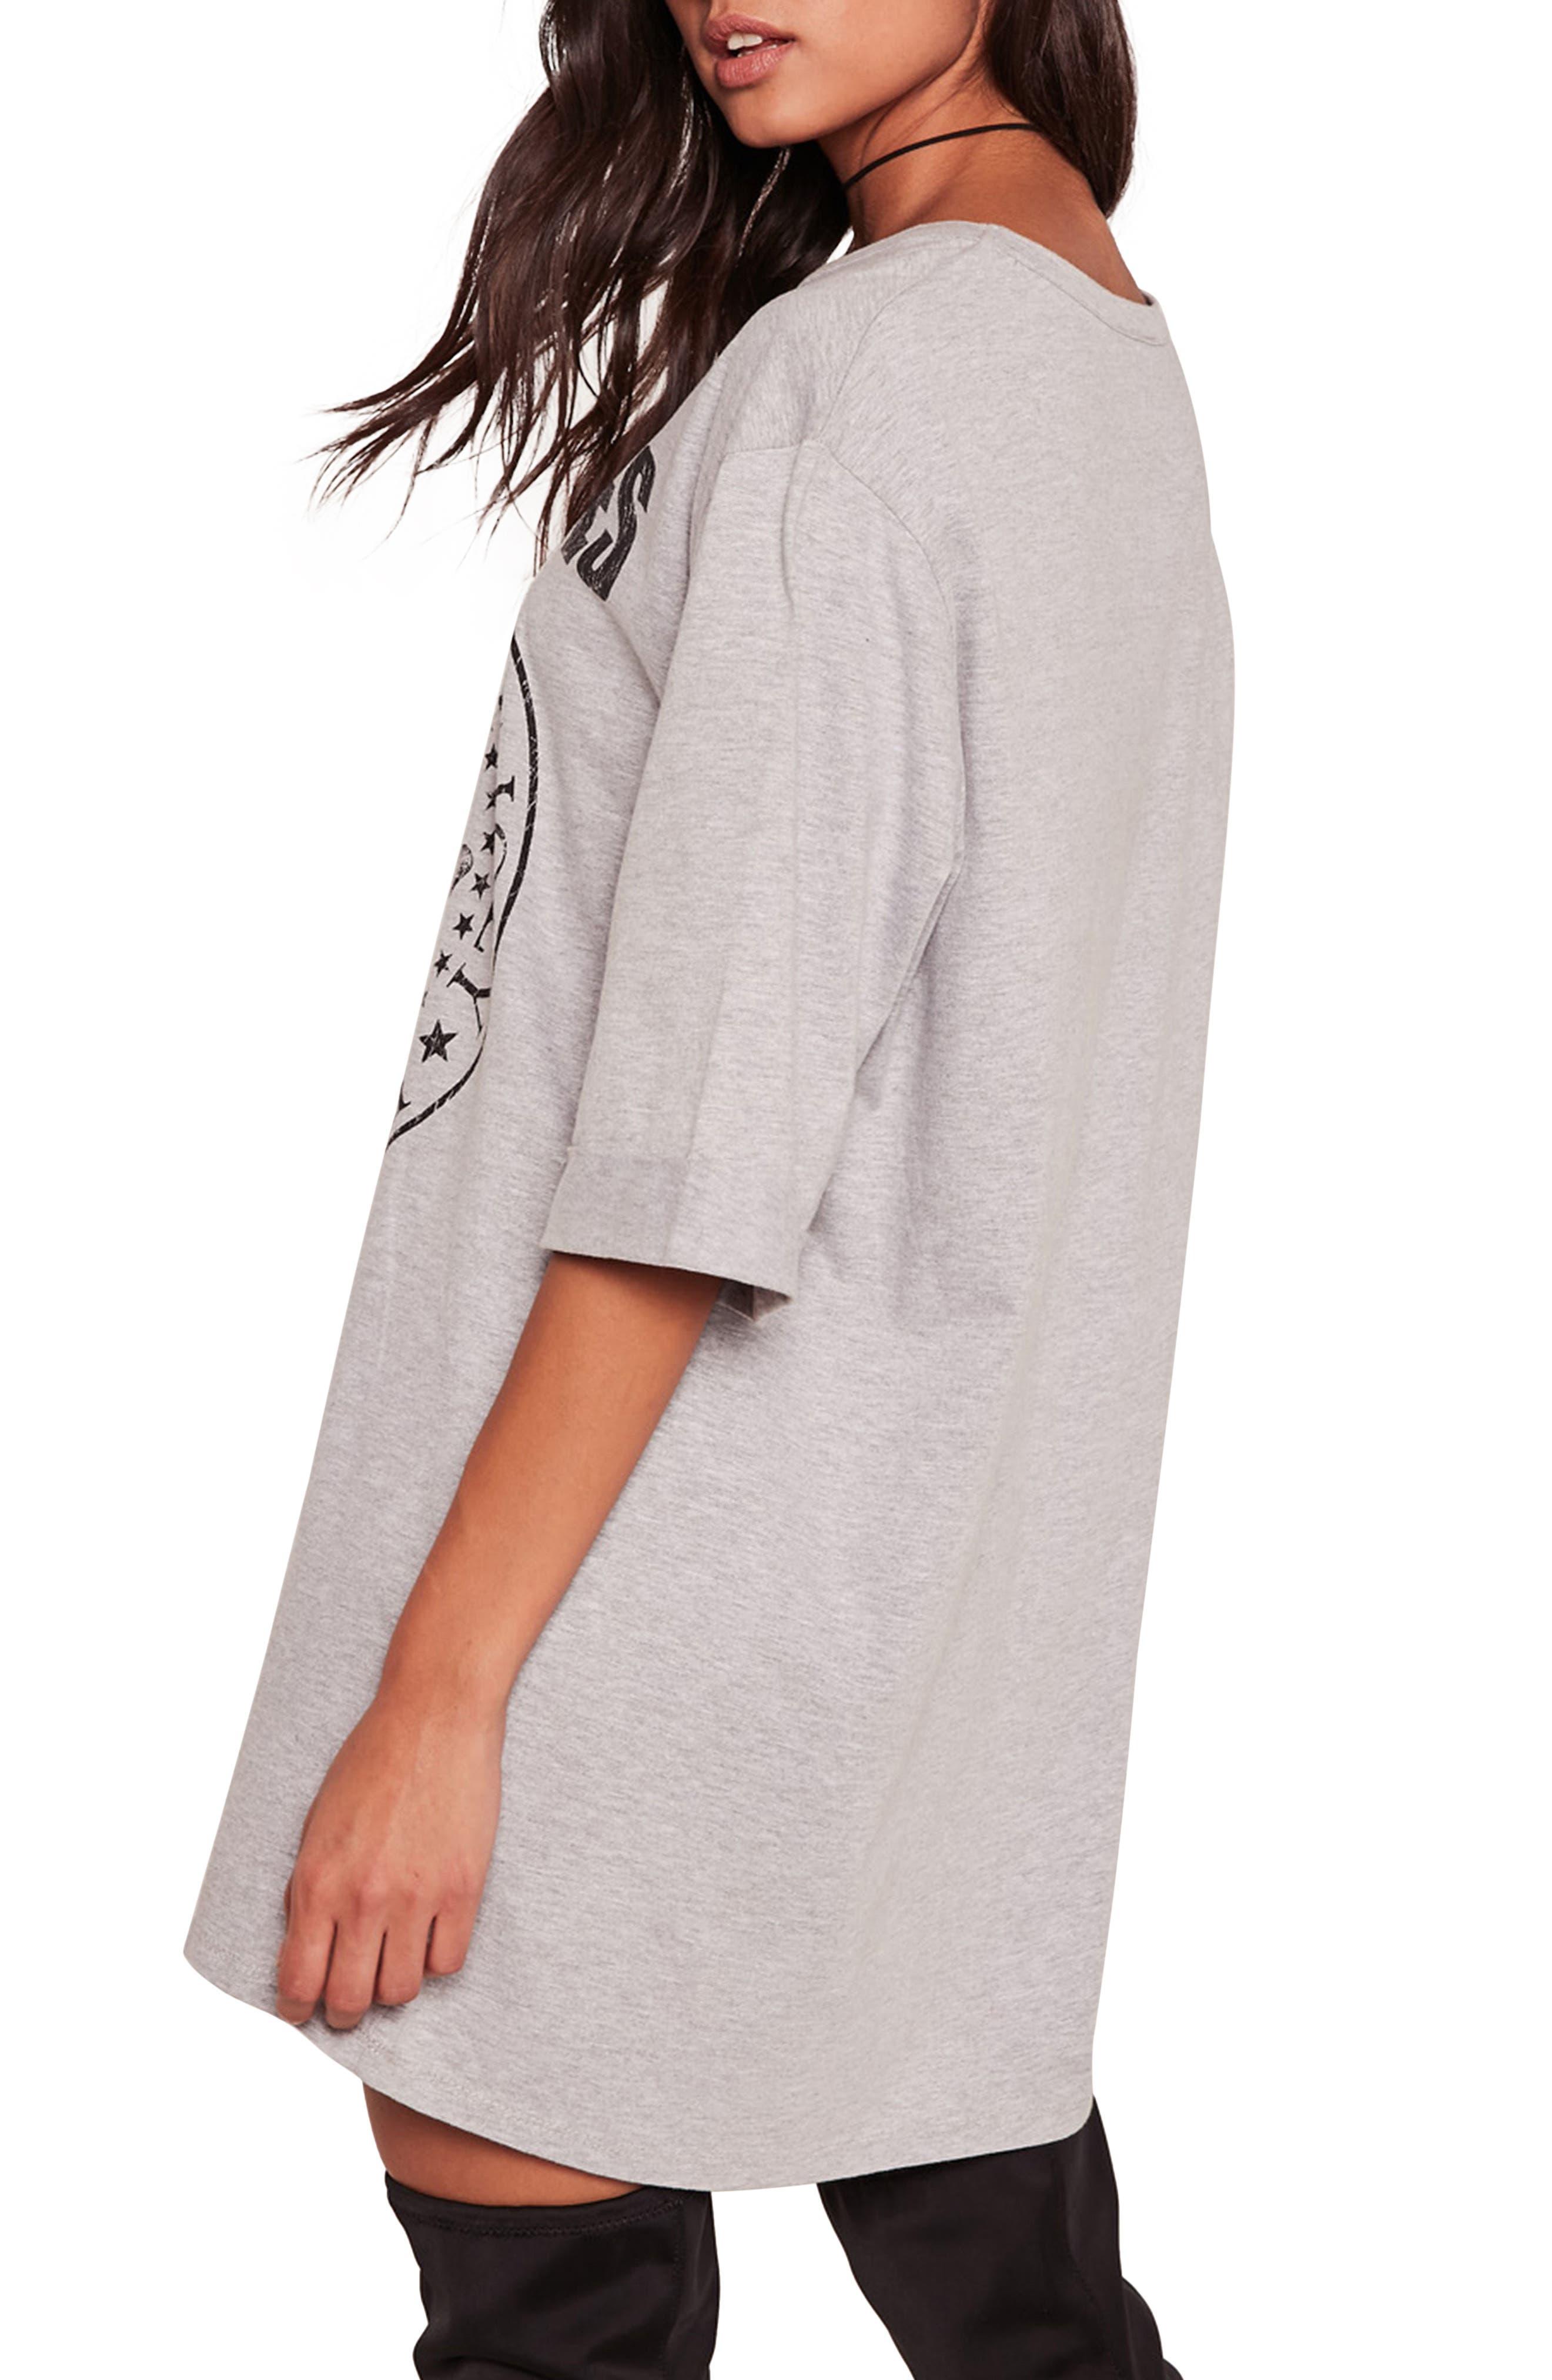 Ramones T-Shirt Dress,                             Alternate thumbnail 2, color,                             060